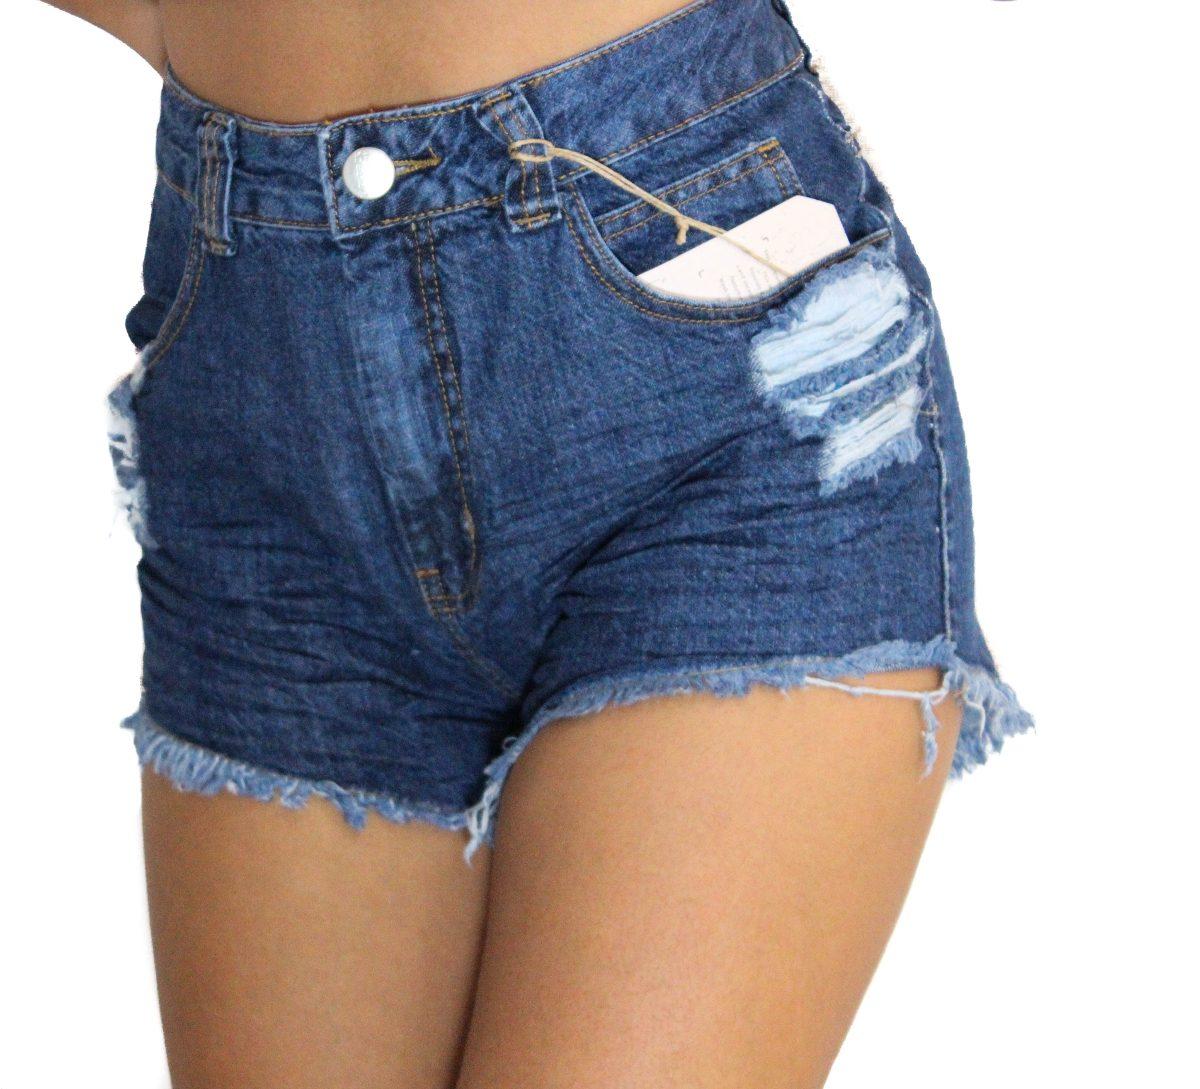 shorts cintura alta hotpants jeans r 89 90 no mercadolivre. Black Bedroom Furniture Sets. Home Design Ideas